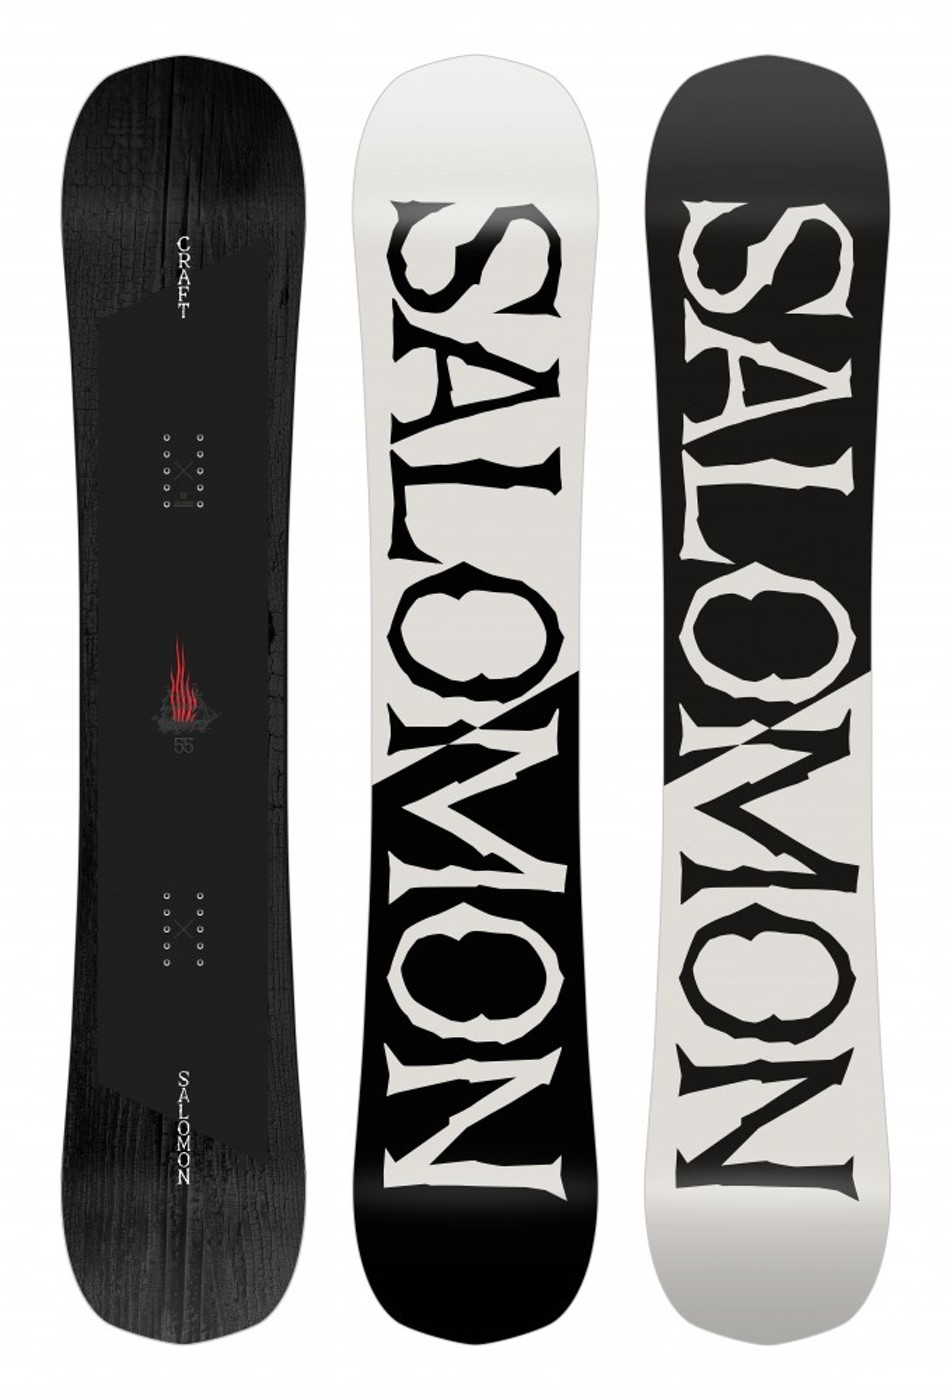 SALOMON SNOWBOARD CRAFT 158